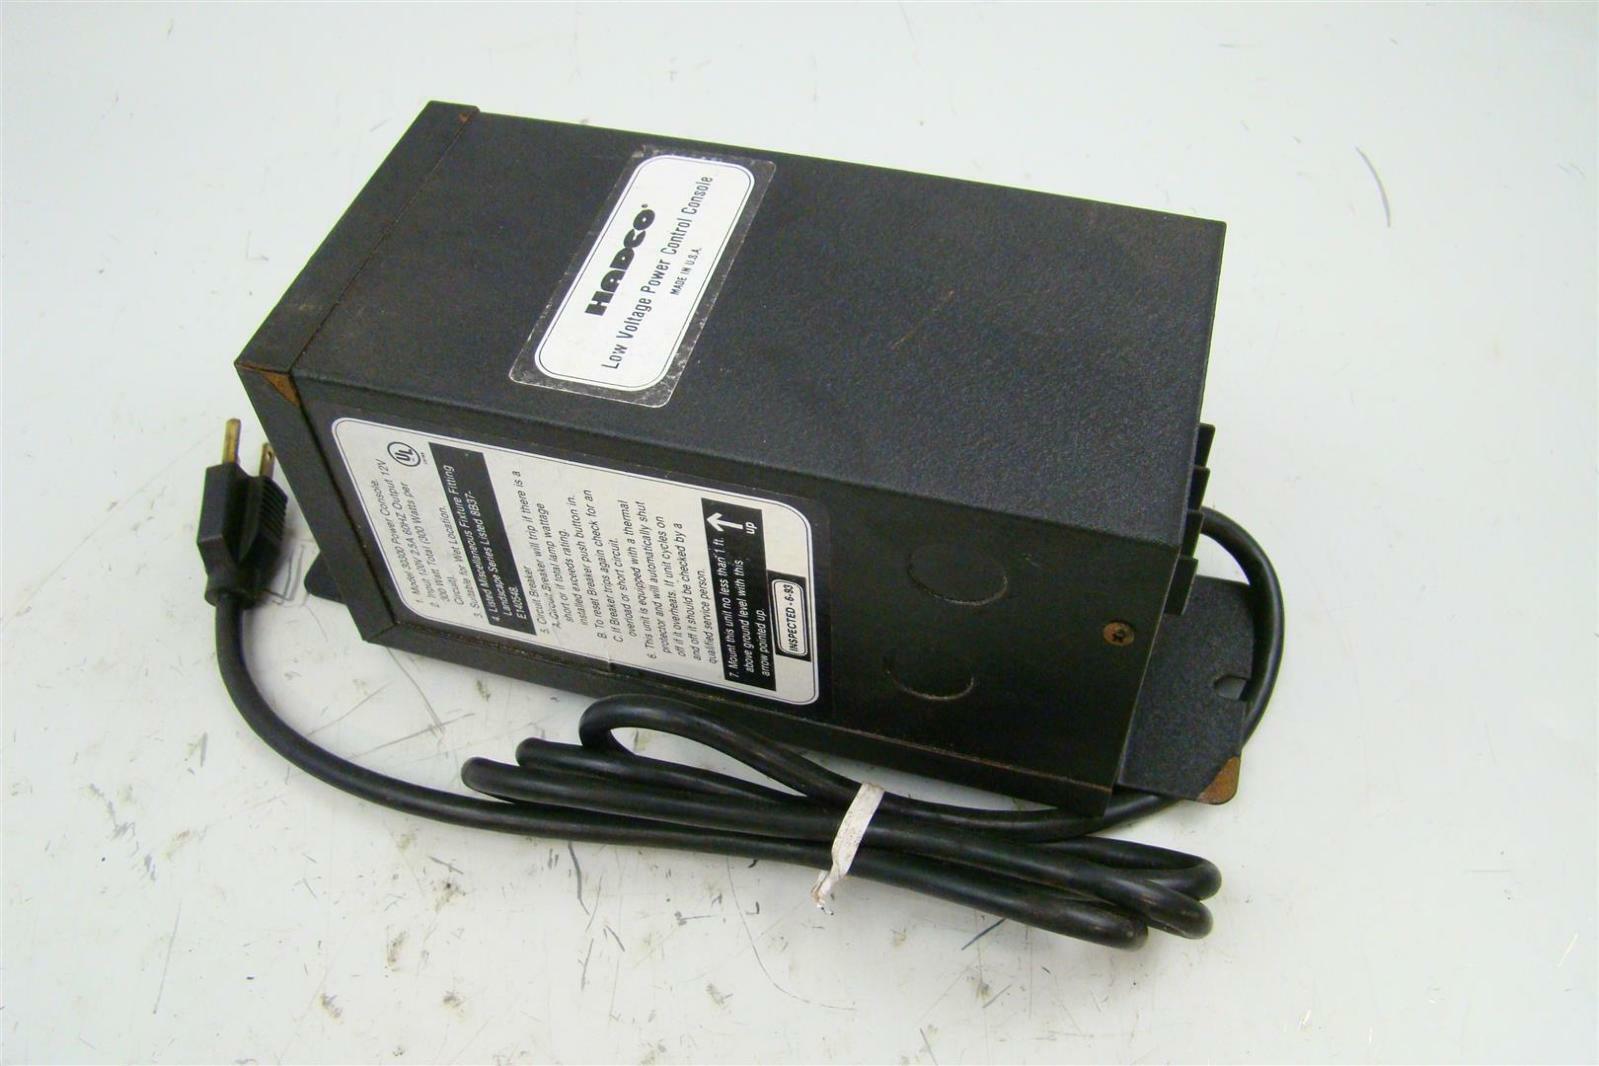 ARK LIGHTING AT-1-300-12R OUTDOOR 300W 120/>12V TRANSFORMER LOW VOLTAGE